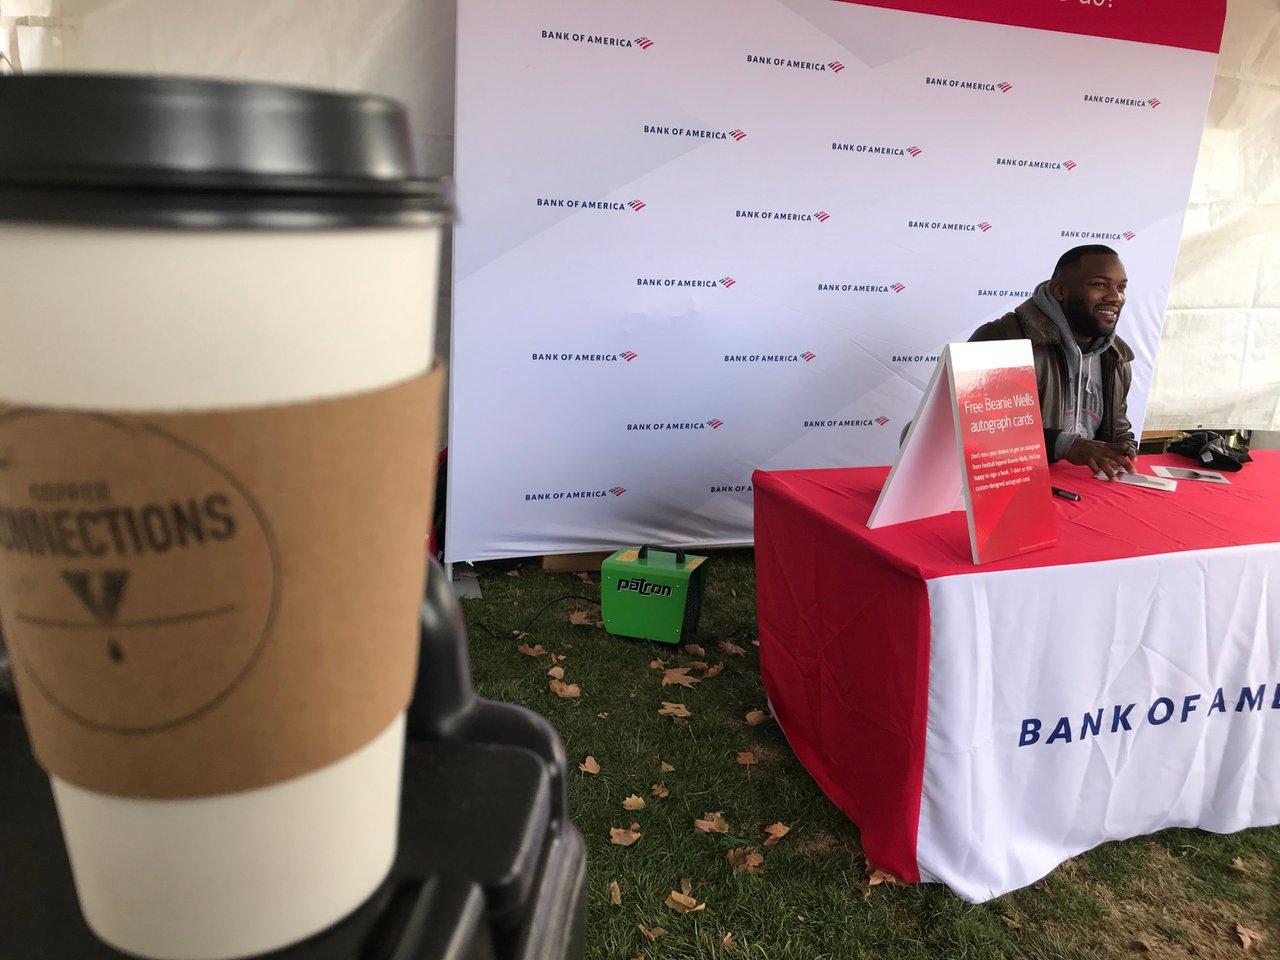 Bank of America - OSU Tailgate photo image3.jpg